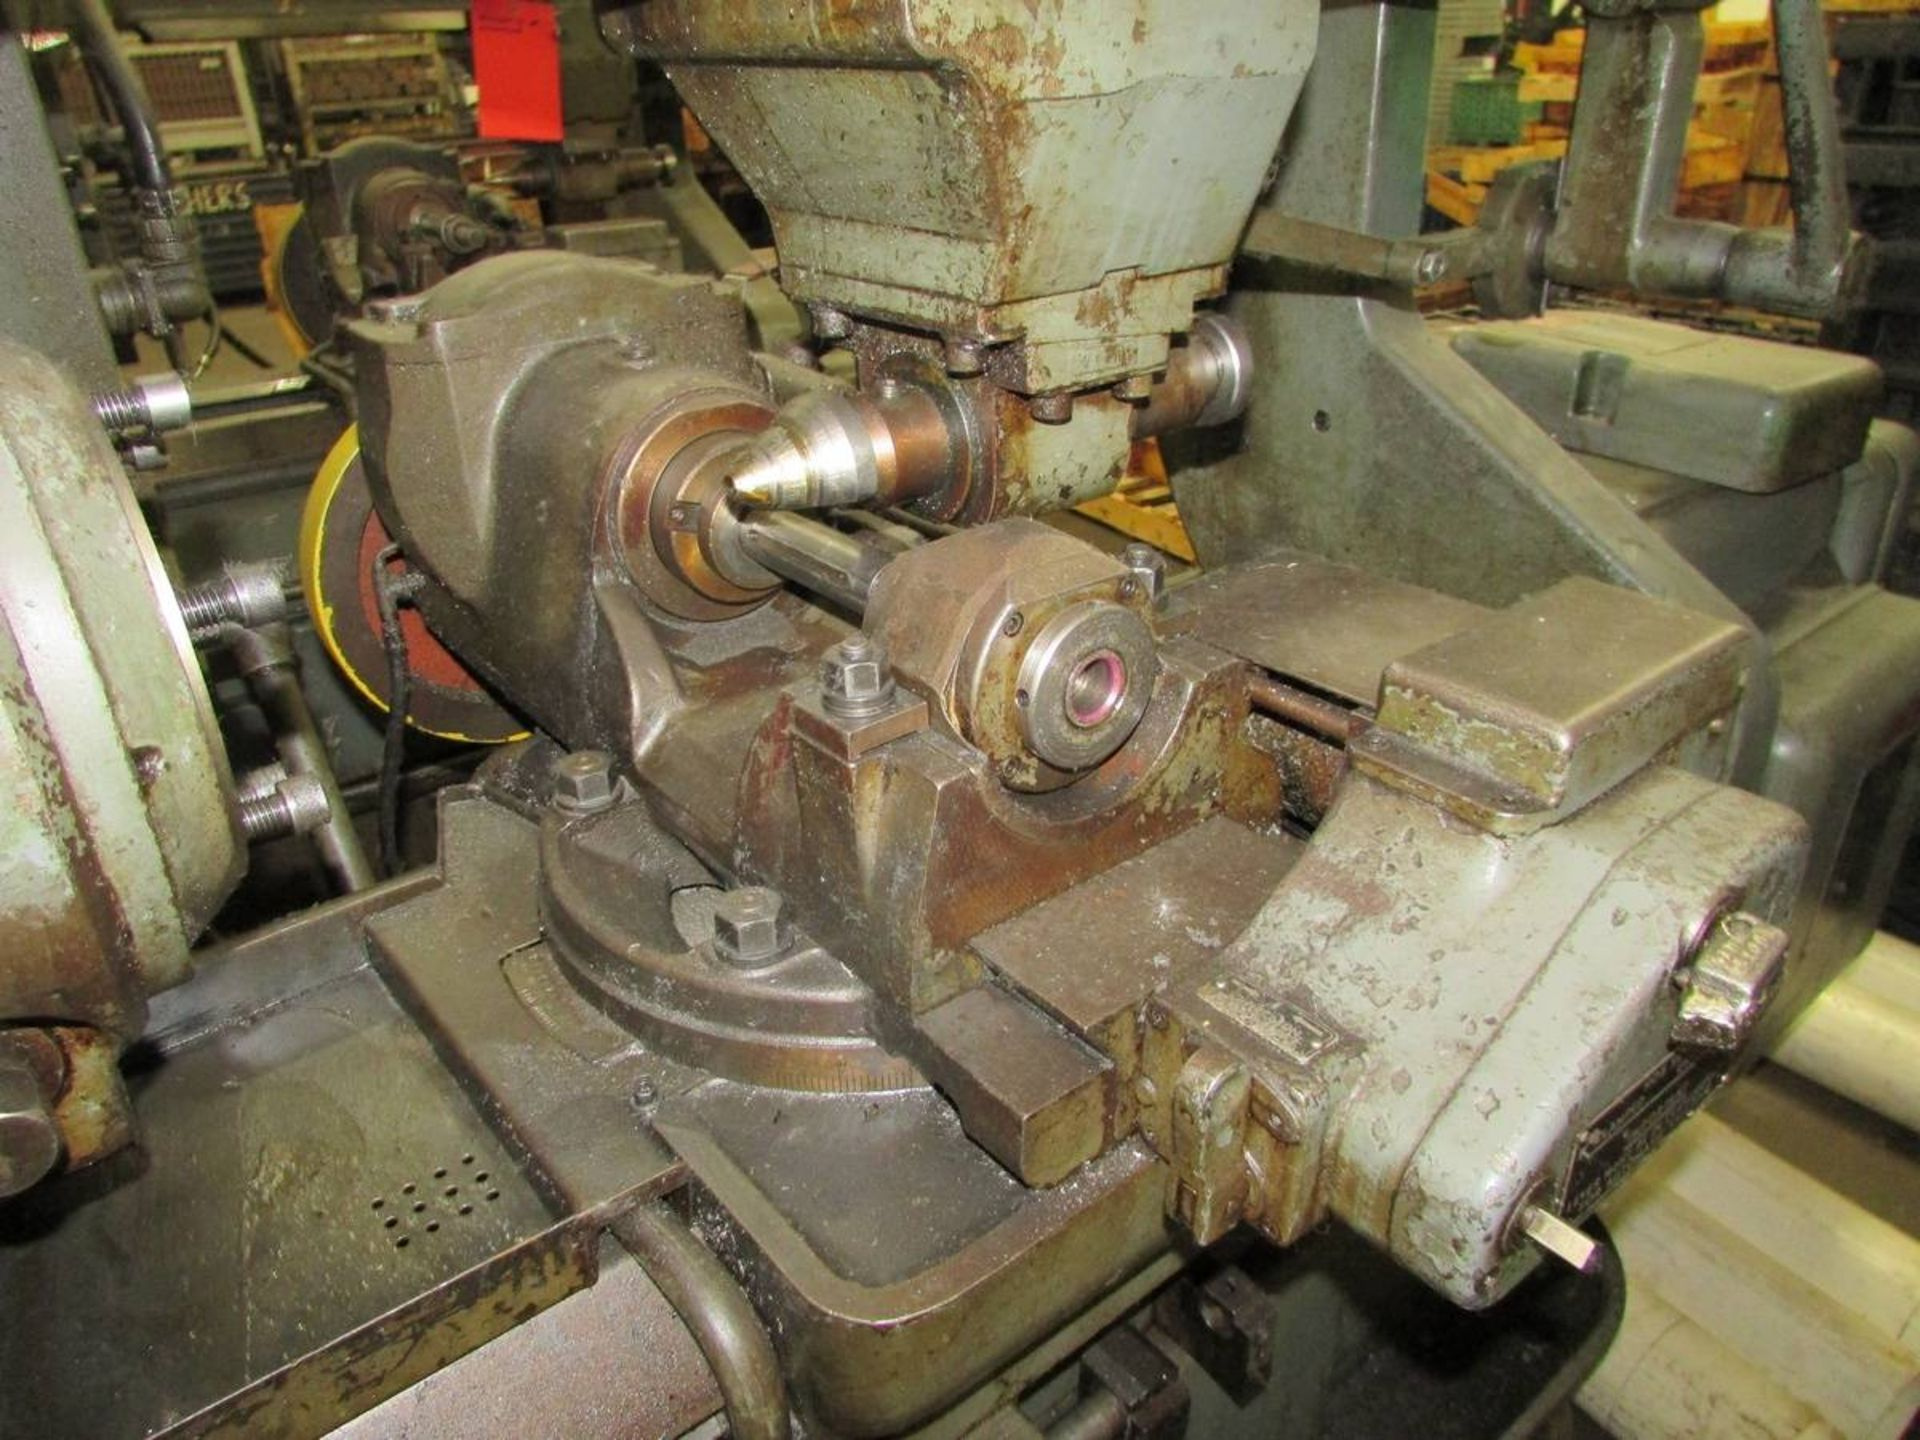 Barber Colman 16-16 Gear Hobbing Machine - Image 5 of 24